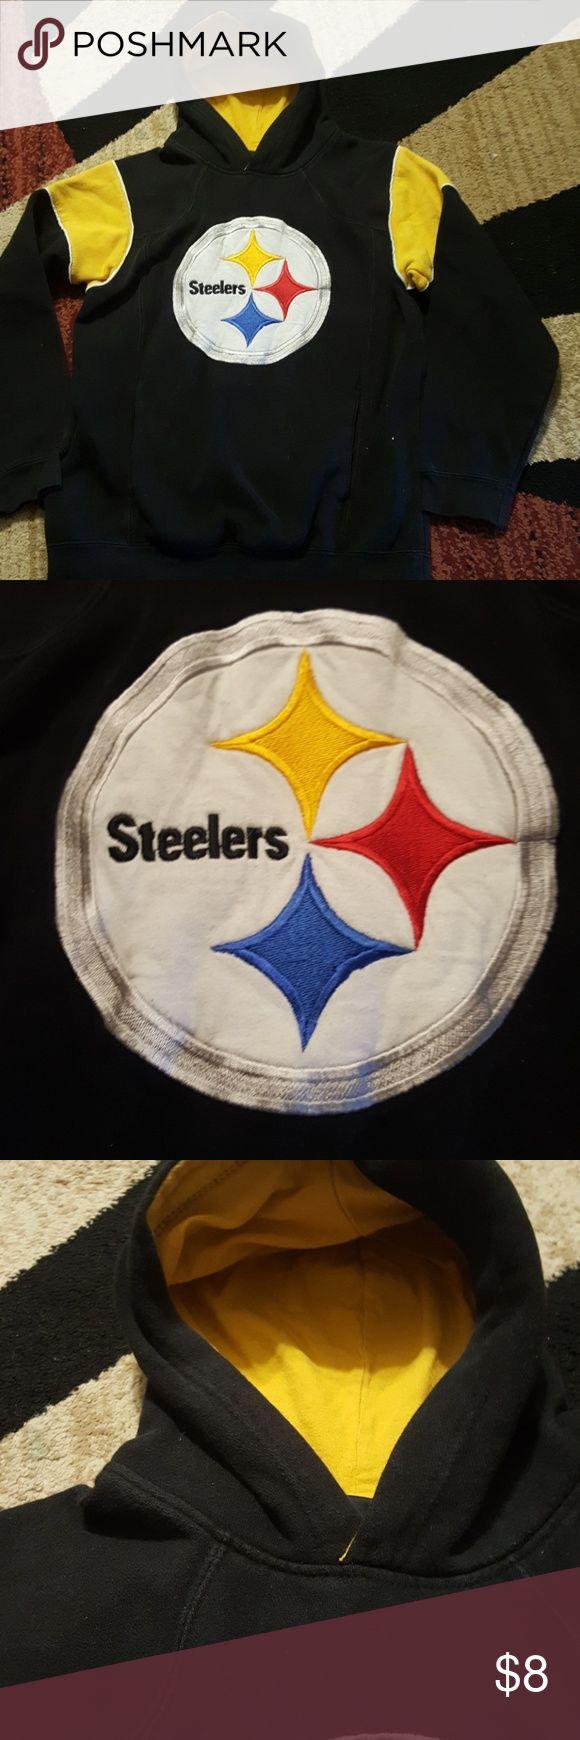 Kids Steelers sweatshirt Kids loved this .just outgrew..70%coyton,30% polyester..tons of life left...gooo steelers!!!sz 10-12..boy or girl nfl Shirts & Tops Sweatshirts & Hoodies